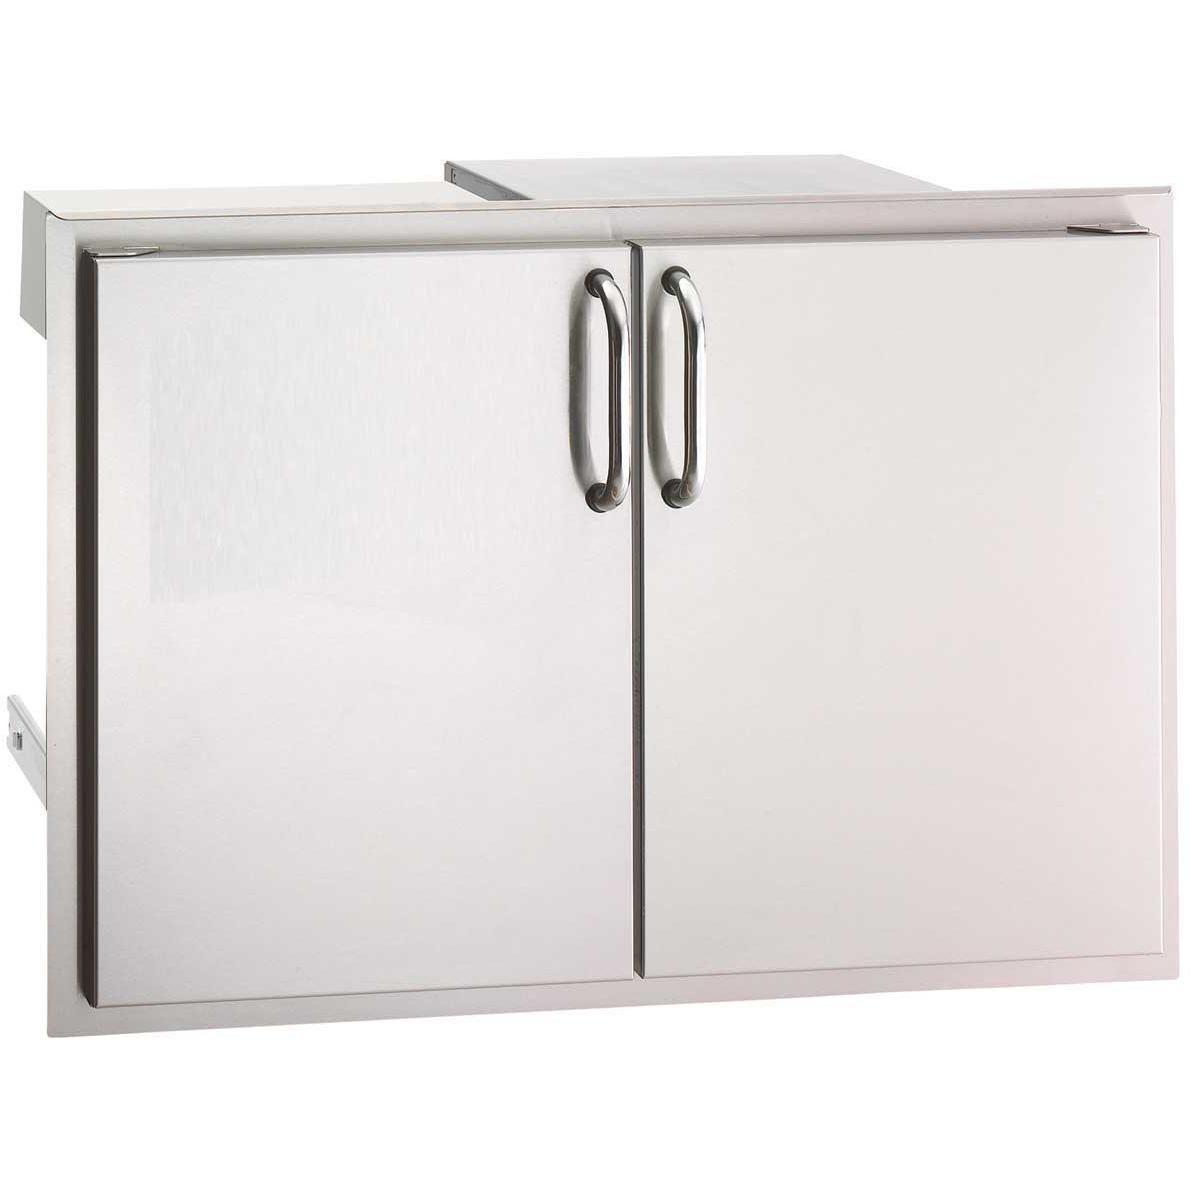 Fire Magic Select 30 Double Access Door With Drawers And Trash Bin Storage 33930s 12 Storage Bins Trash Bins Storage